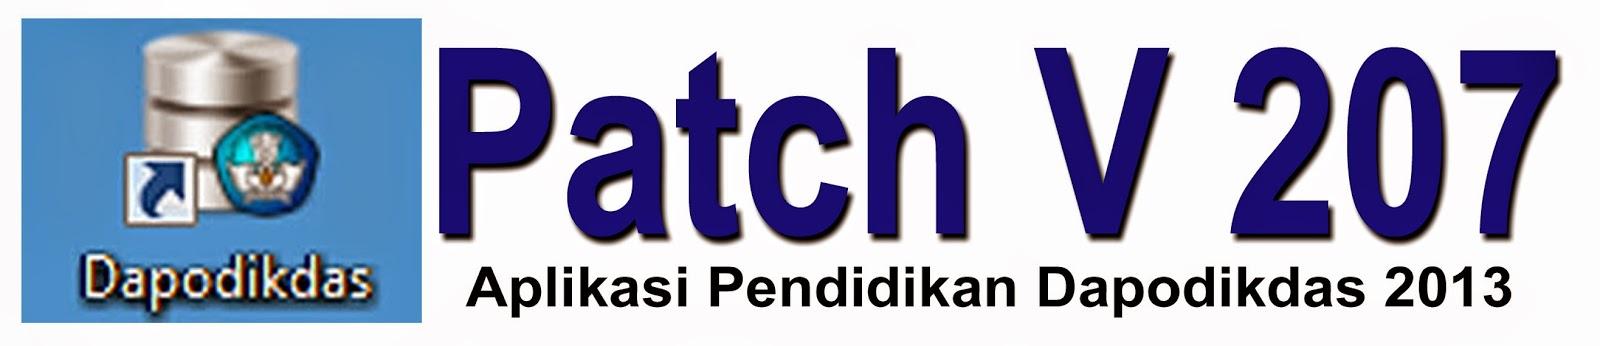 dapodik helper untuk patch 207